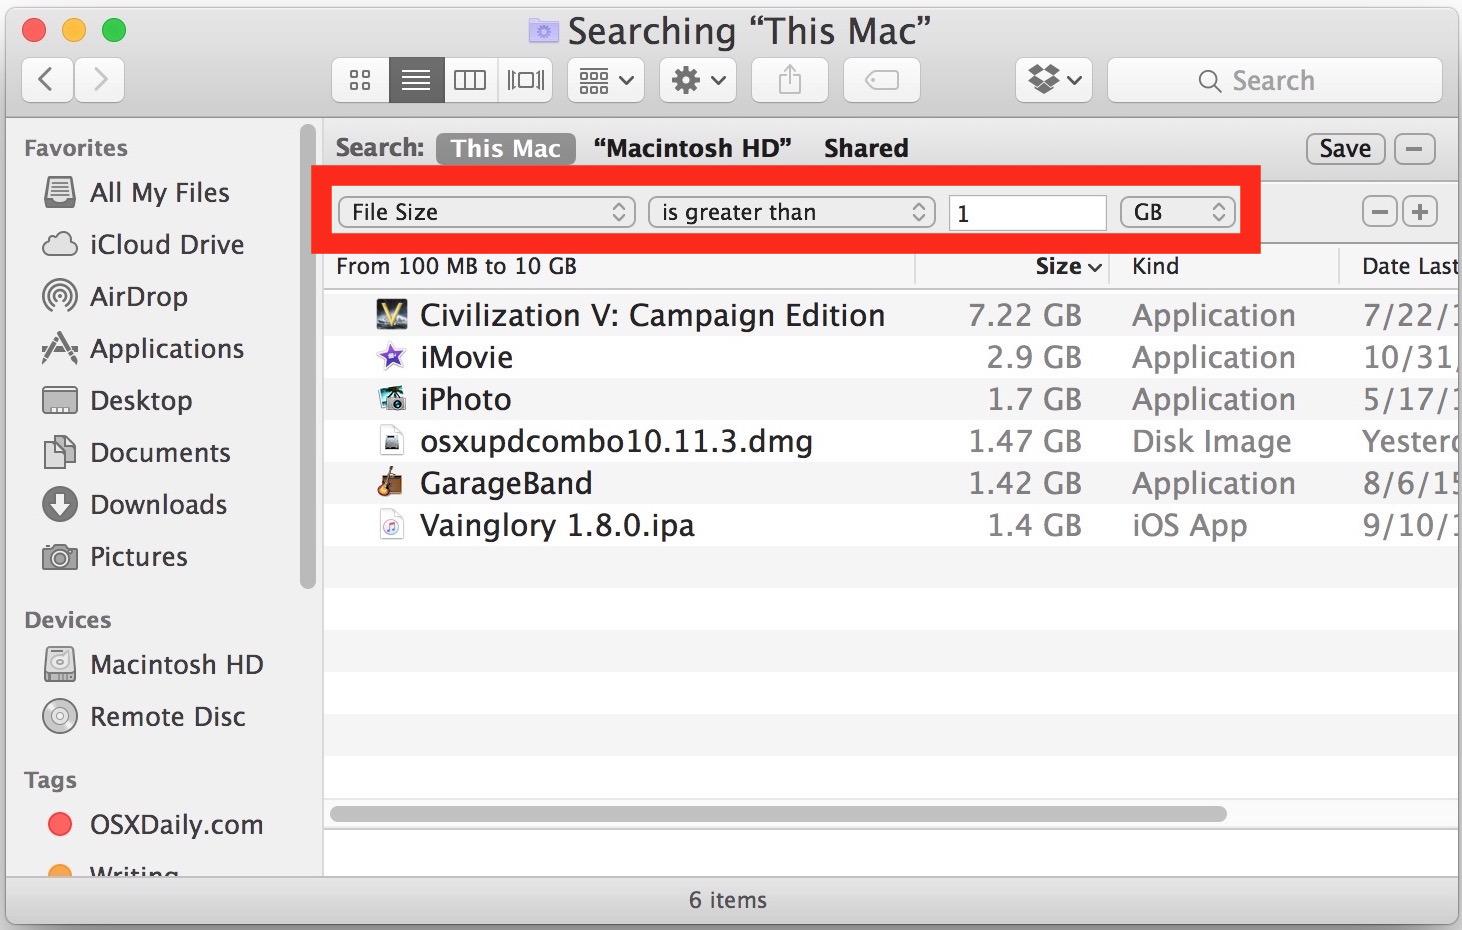 Ricerca di file di dimensioni file di grandi dimensioni nella ricerca di Mac OS X.